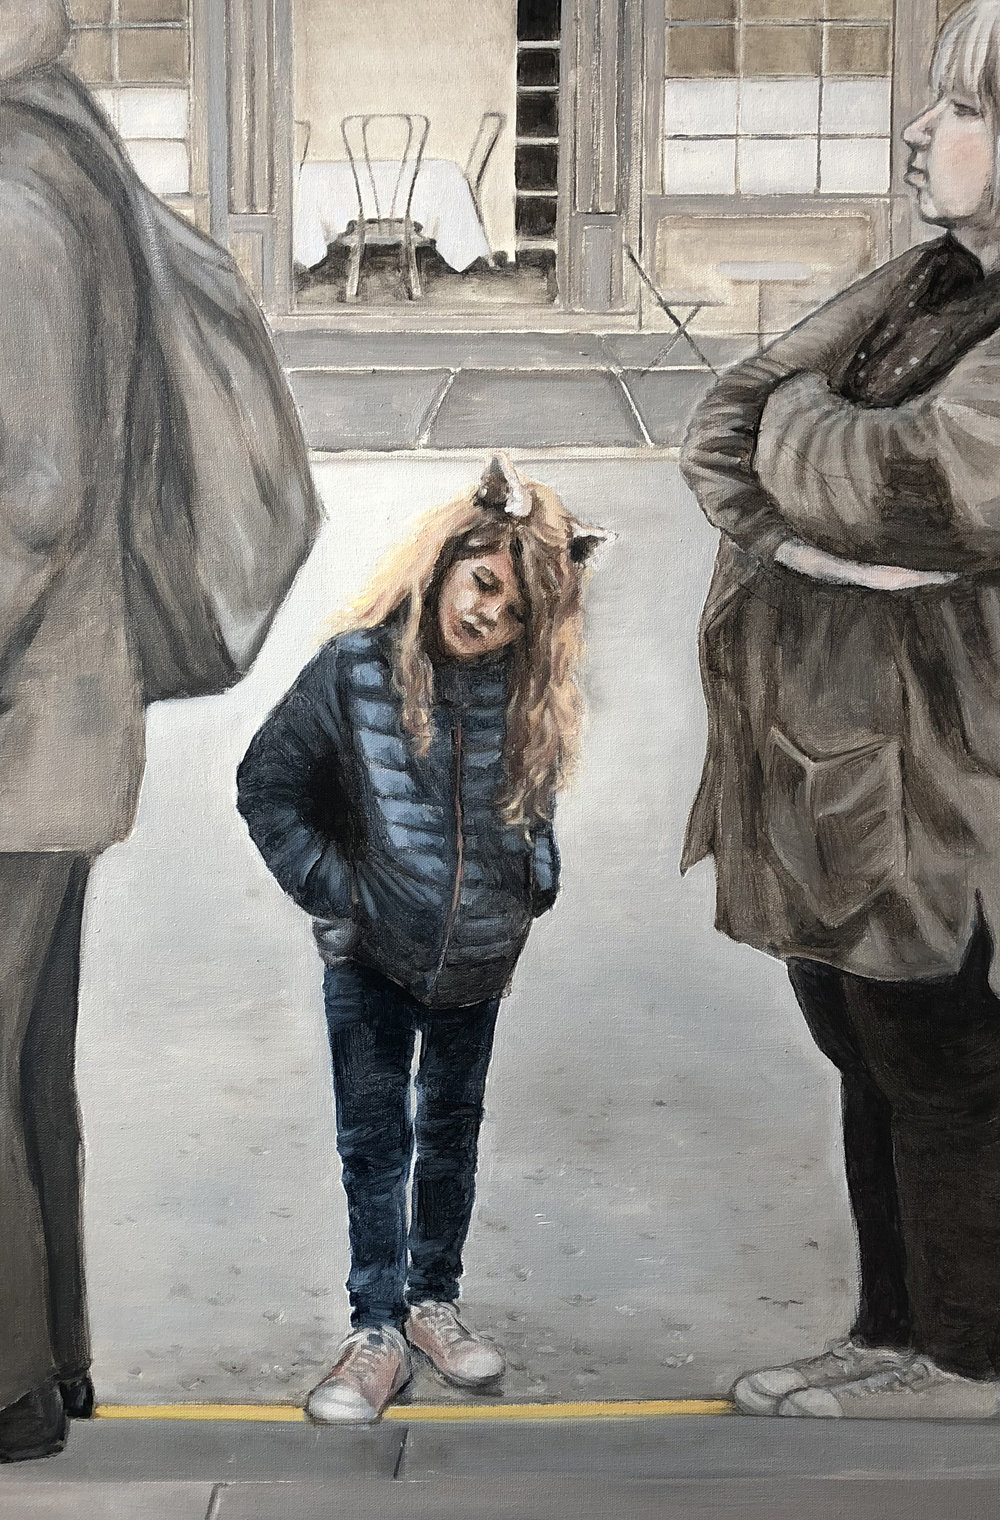 Girl On Line, London, 2018